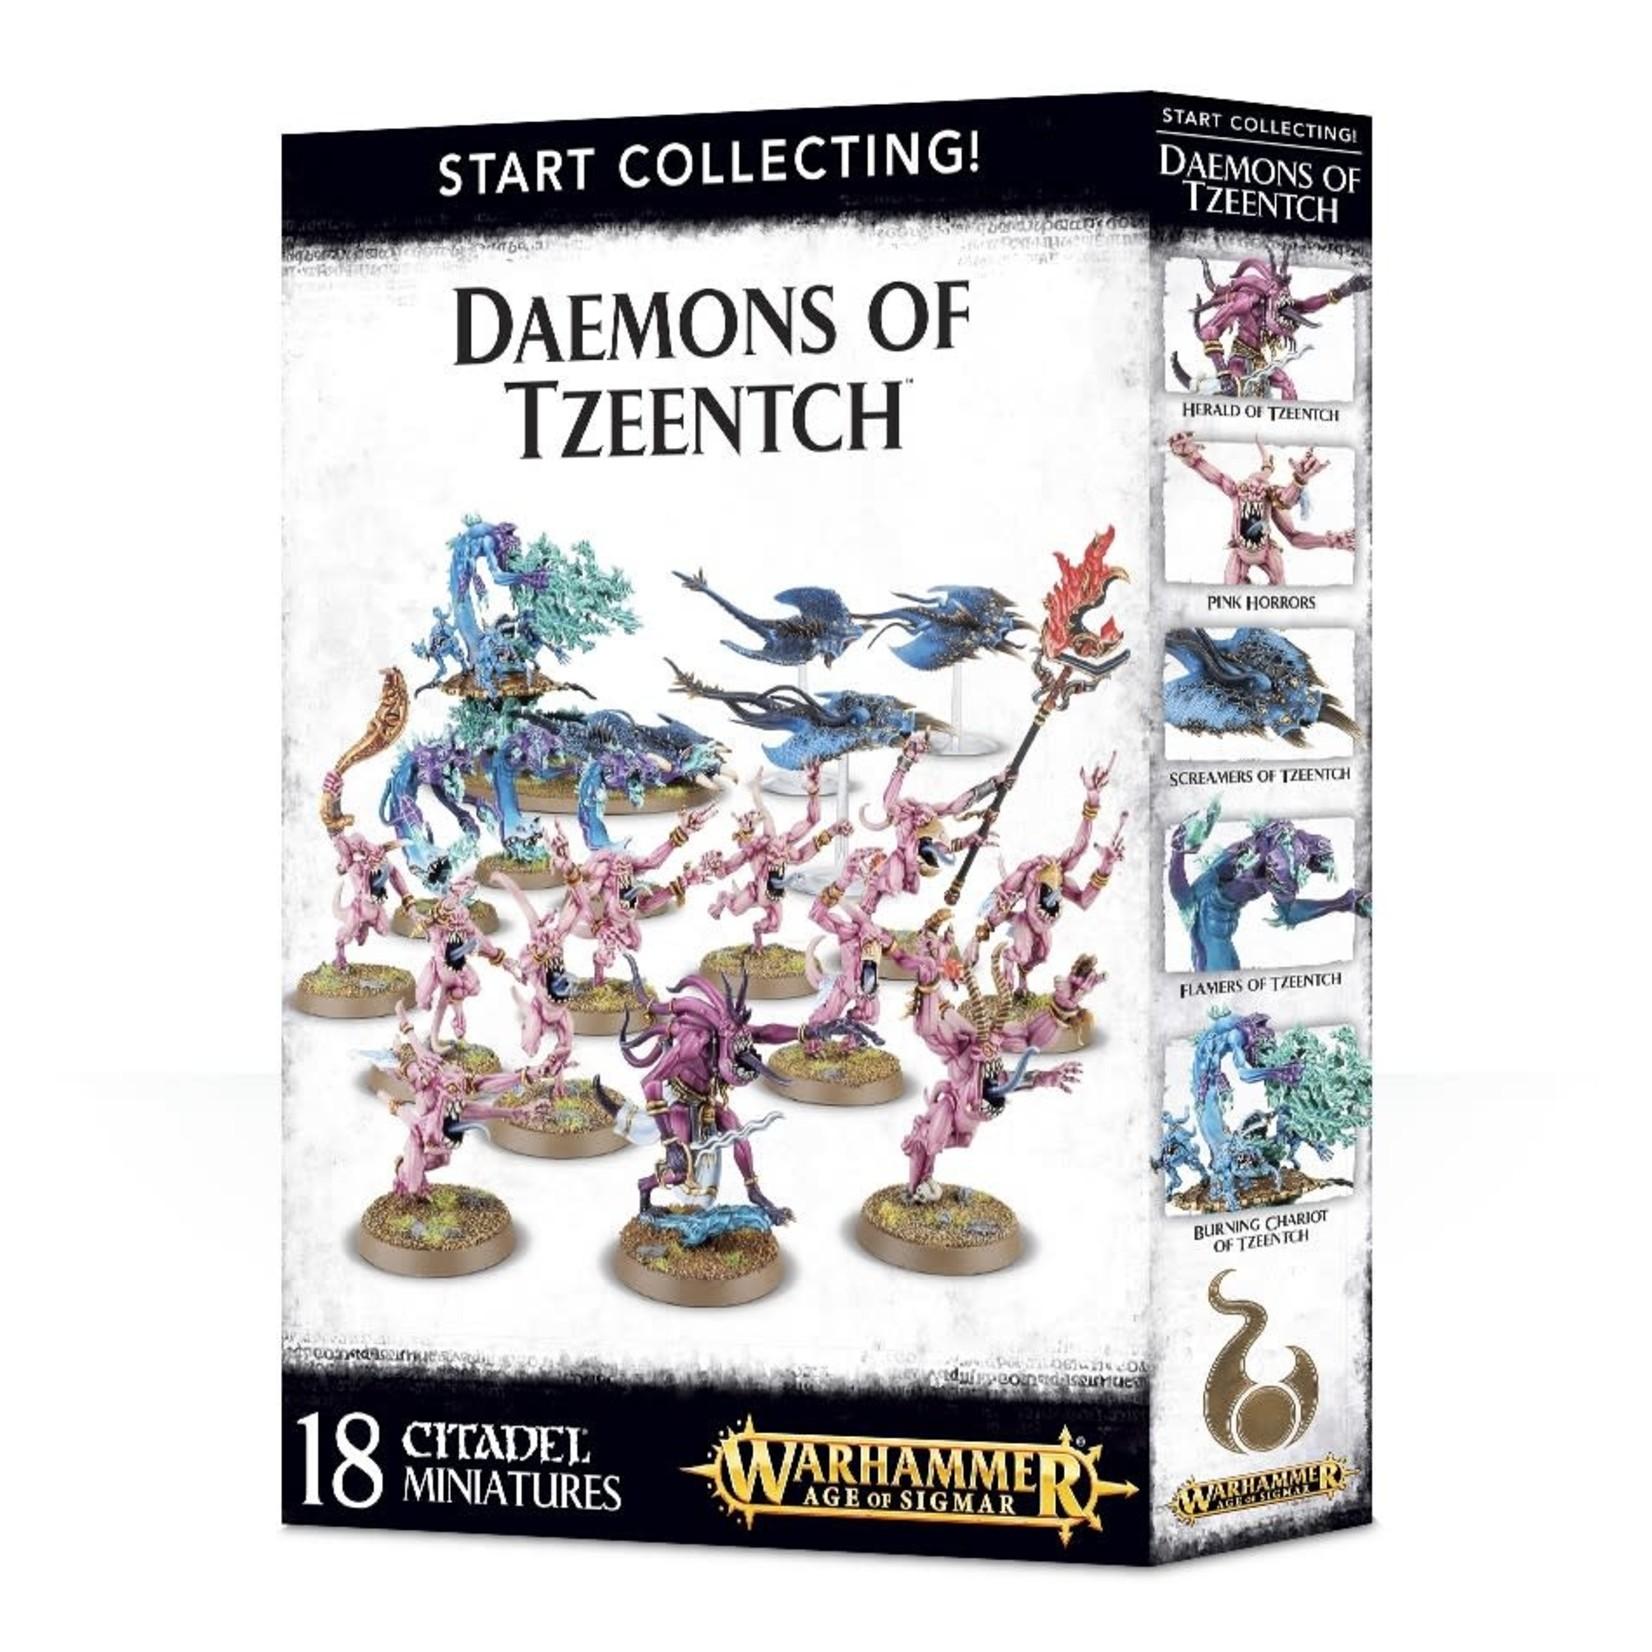 Chaos Daemons START COLLECTING! DAEMONS OF TZEENTCH